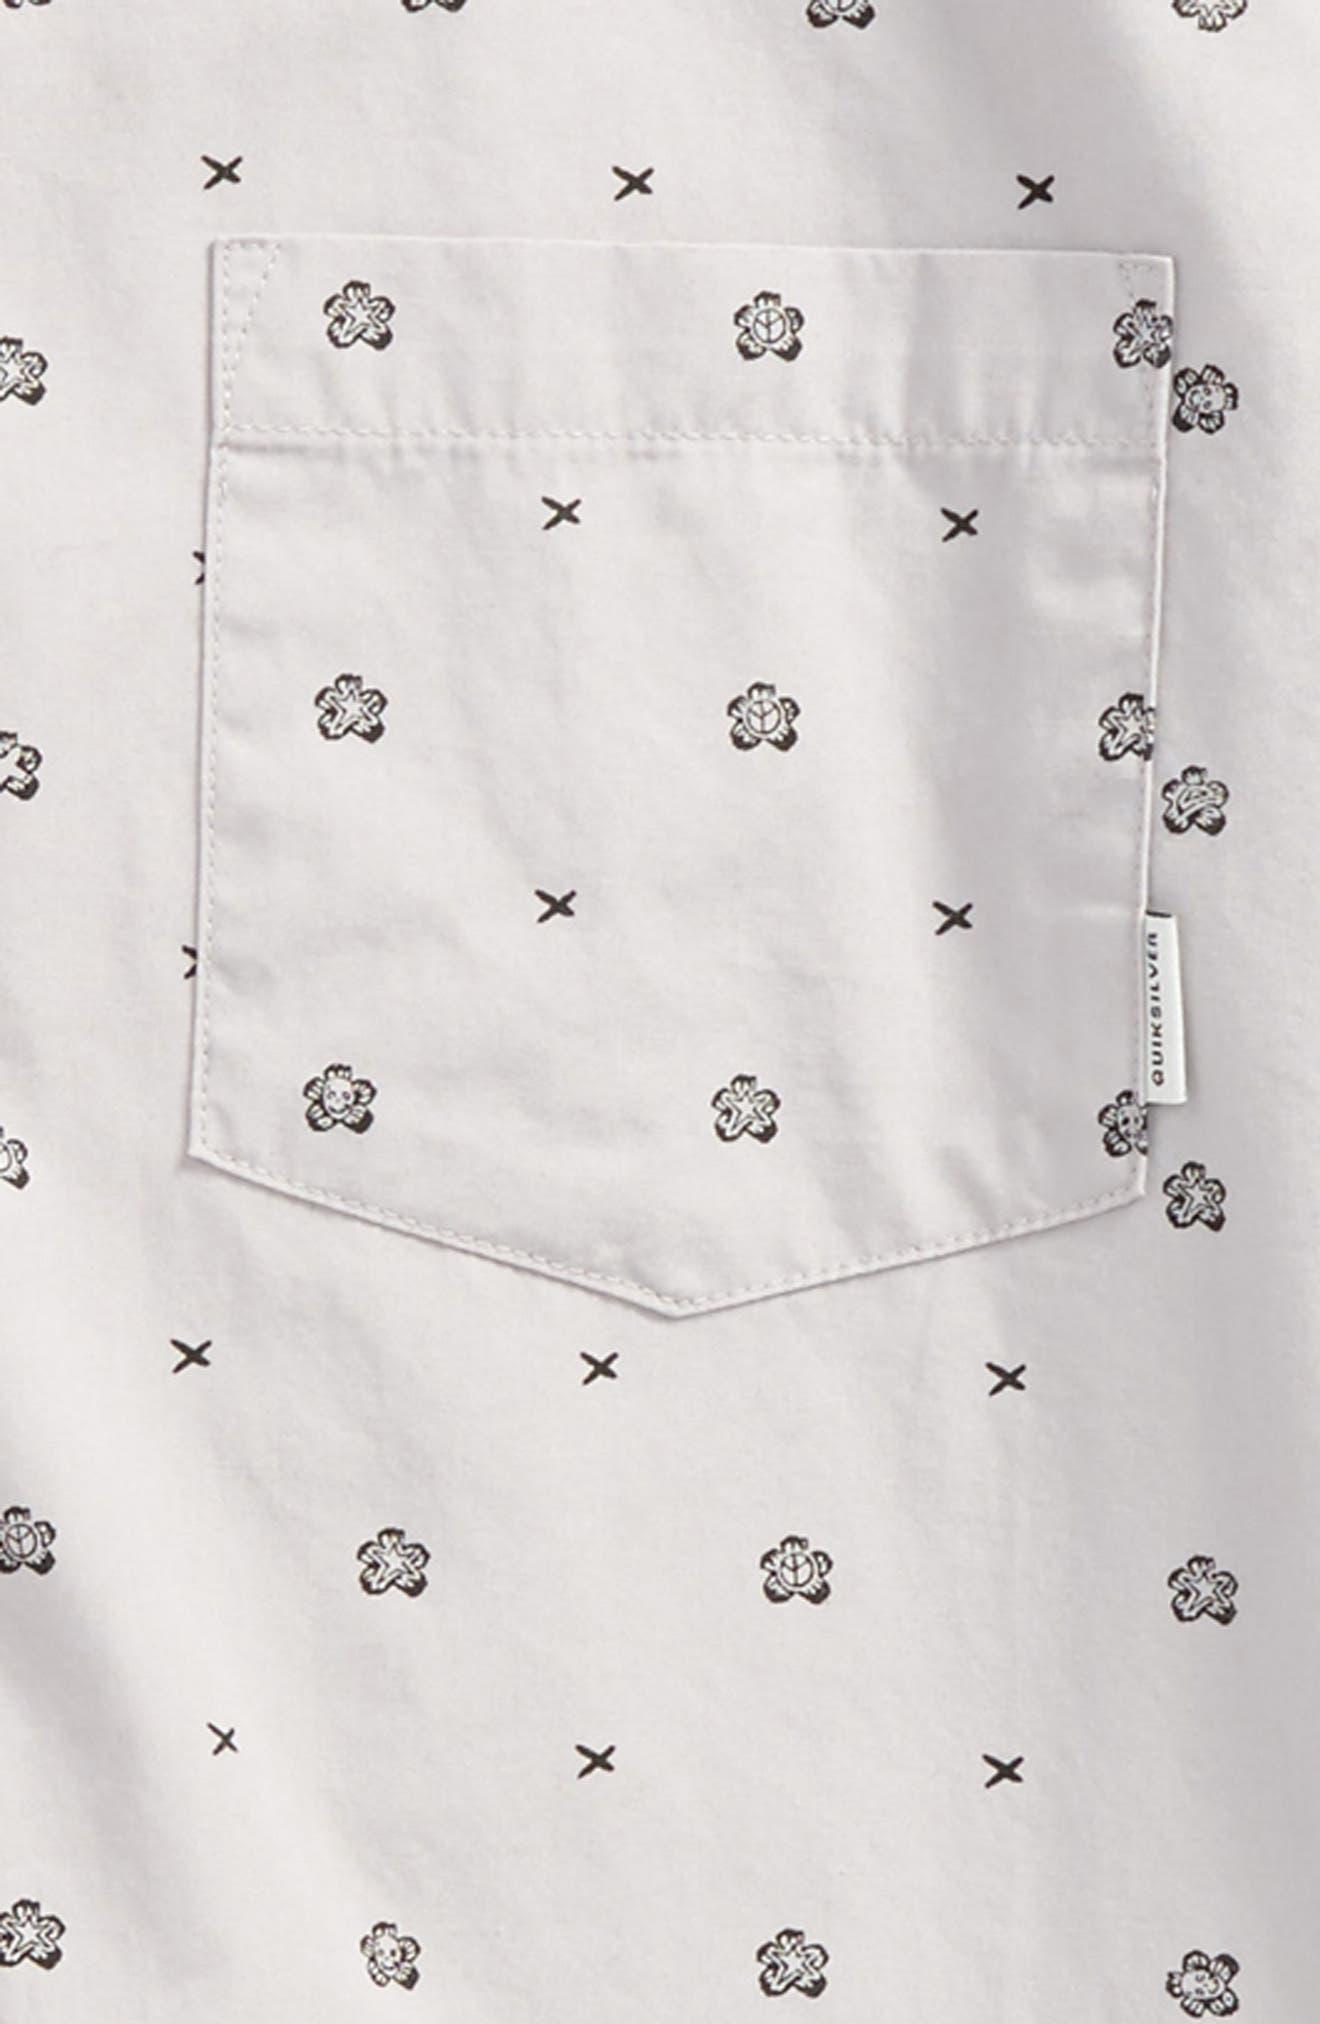 Kamanoa Woven Shirt,                             Alternate thumbnail 2, color,                             Silver Sconce